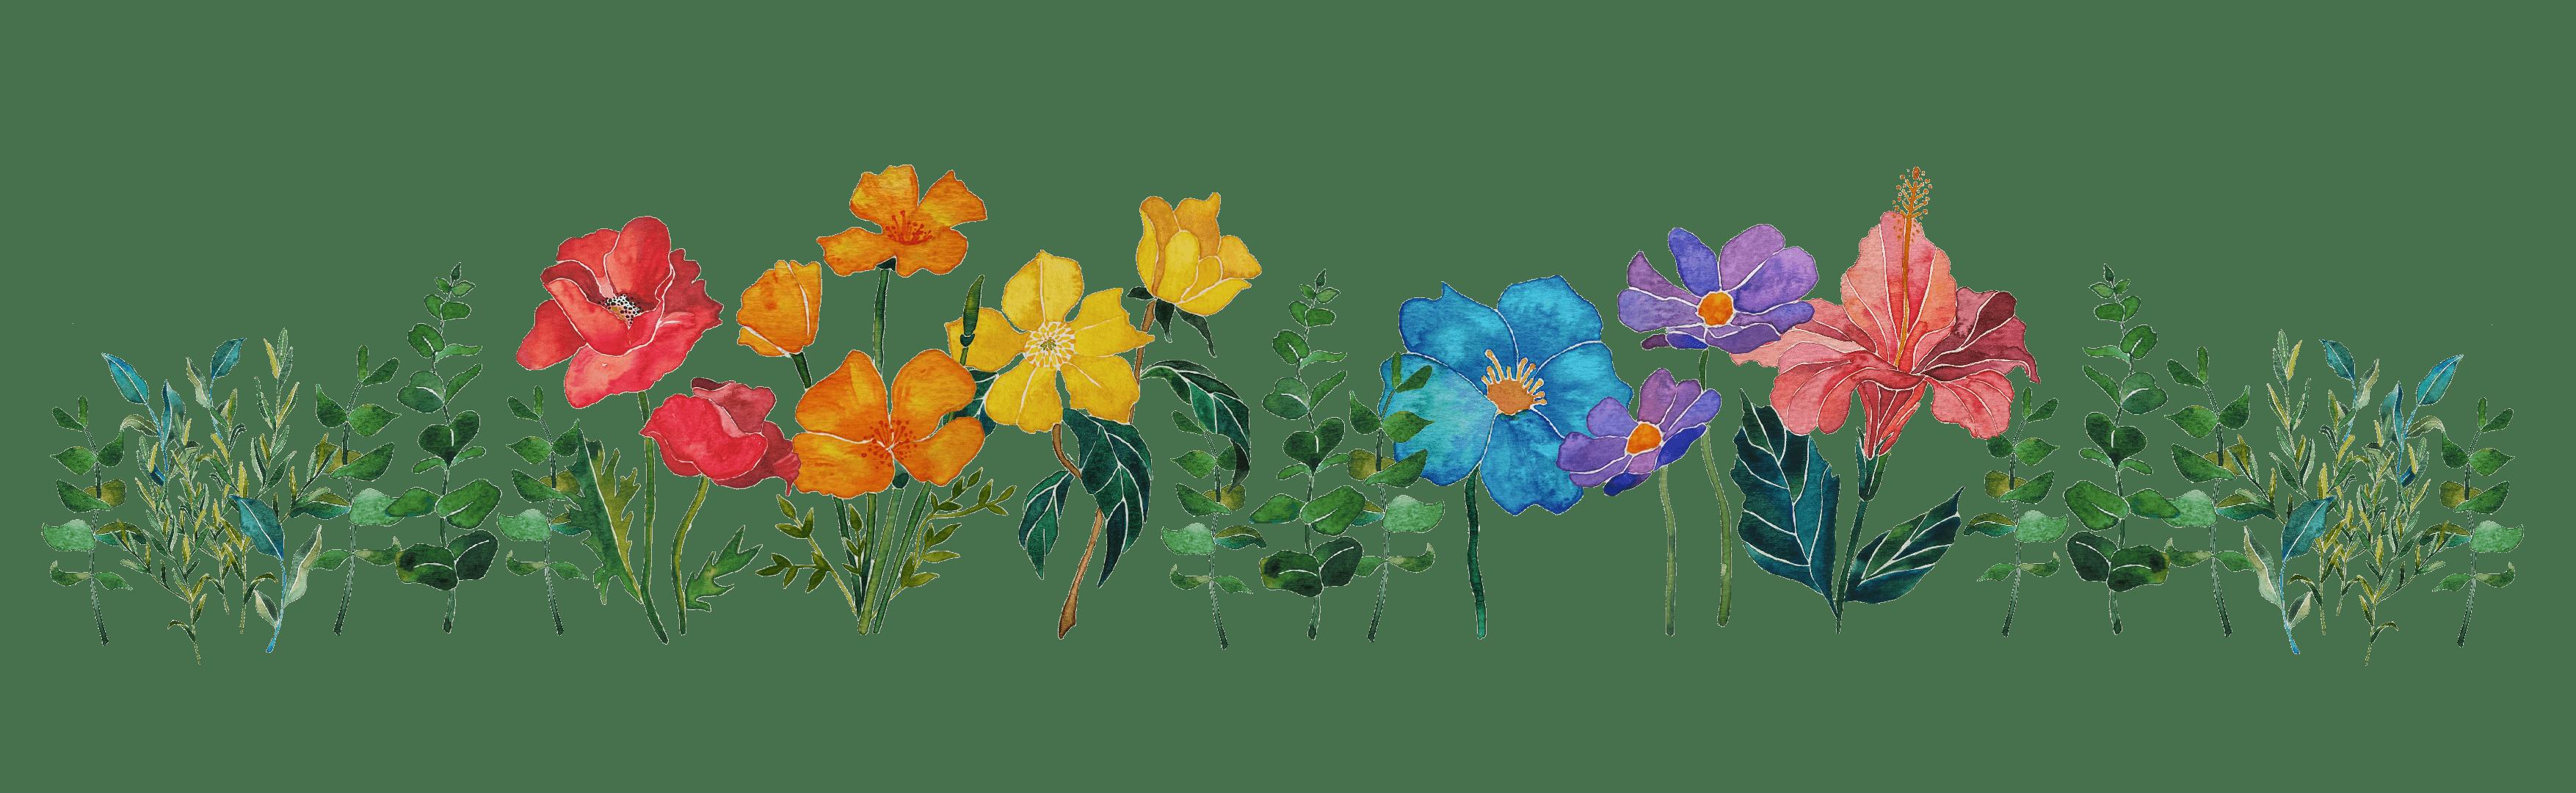 flower-garden-min